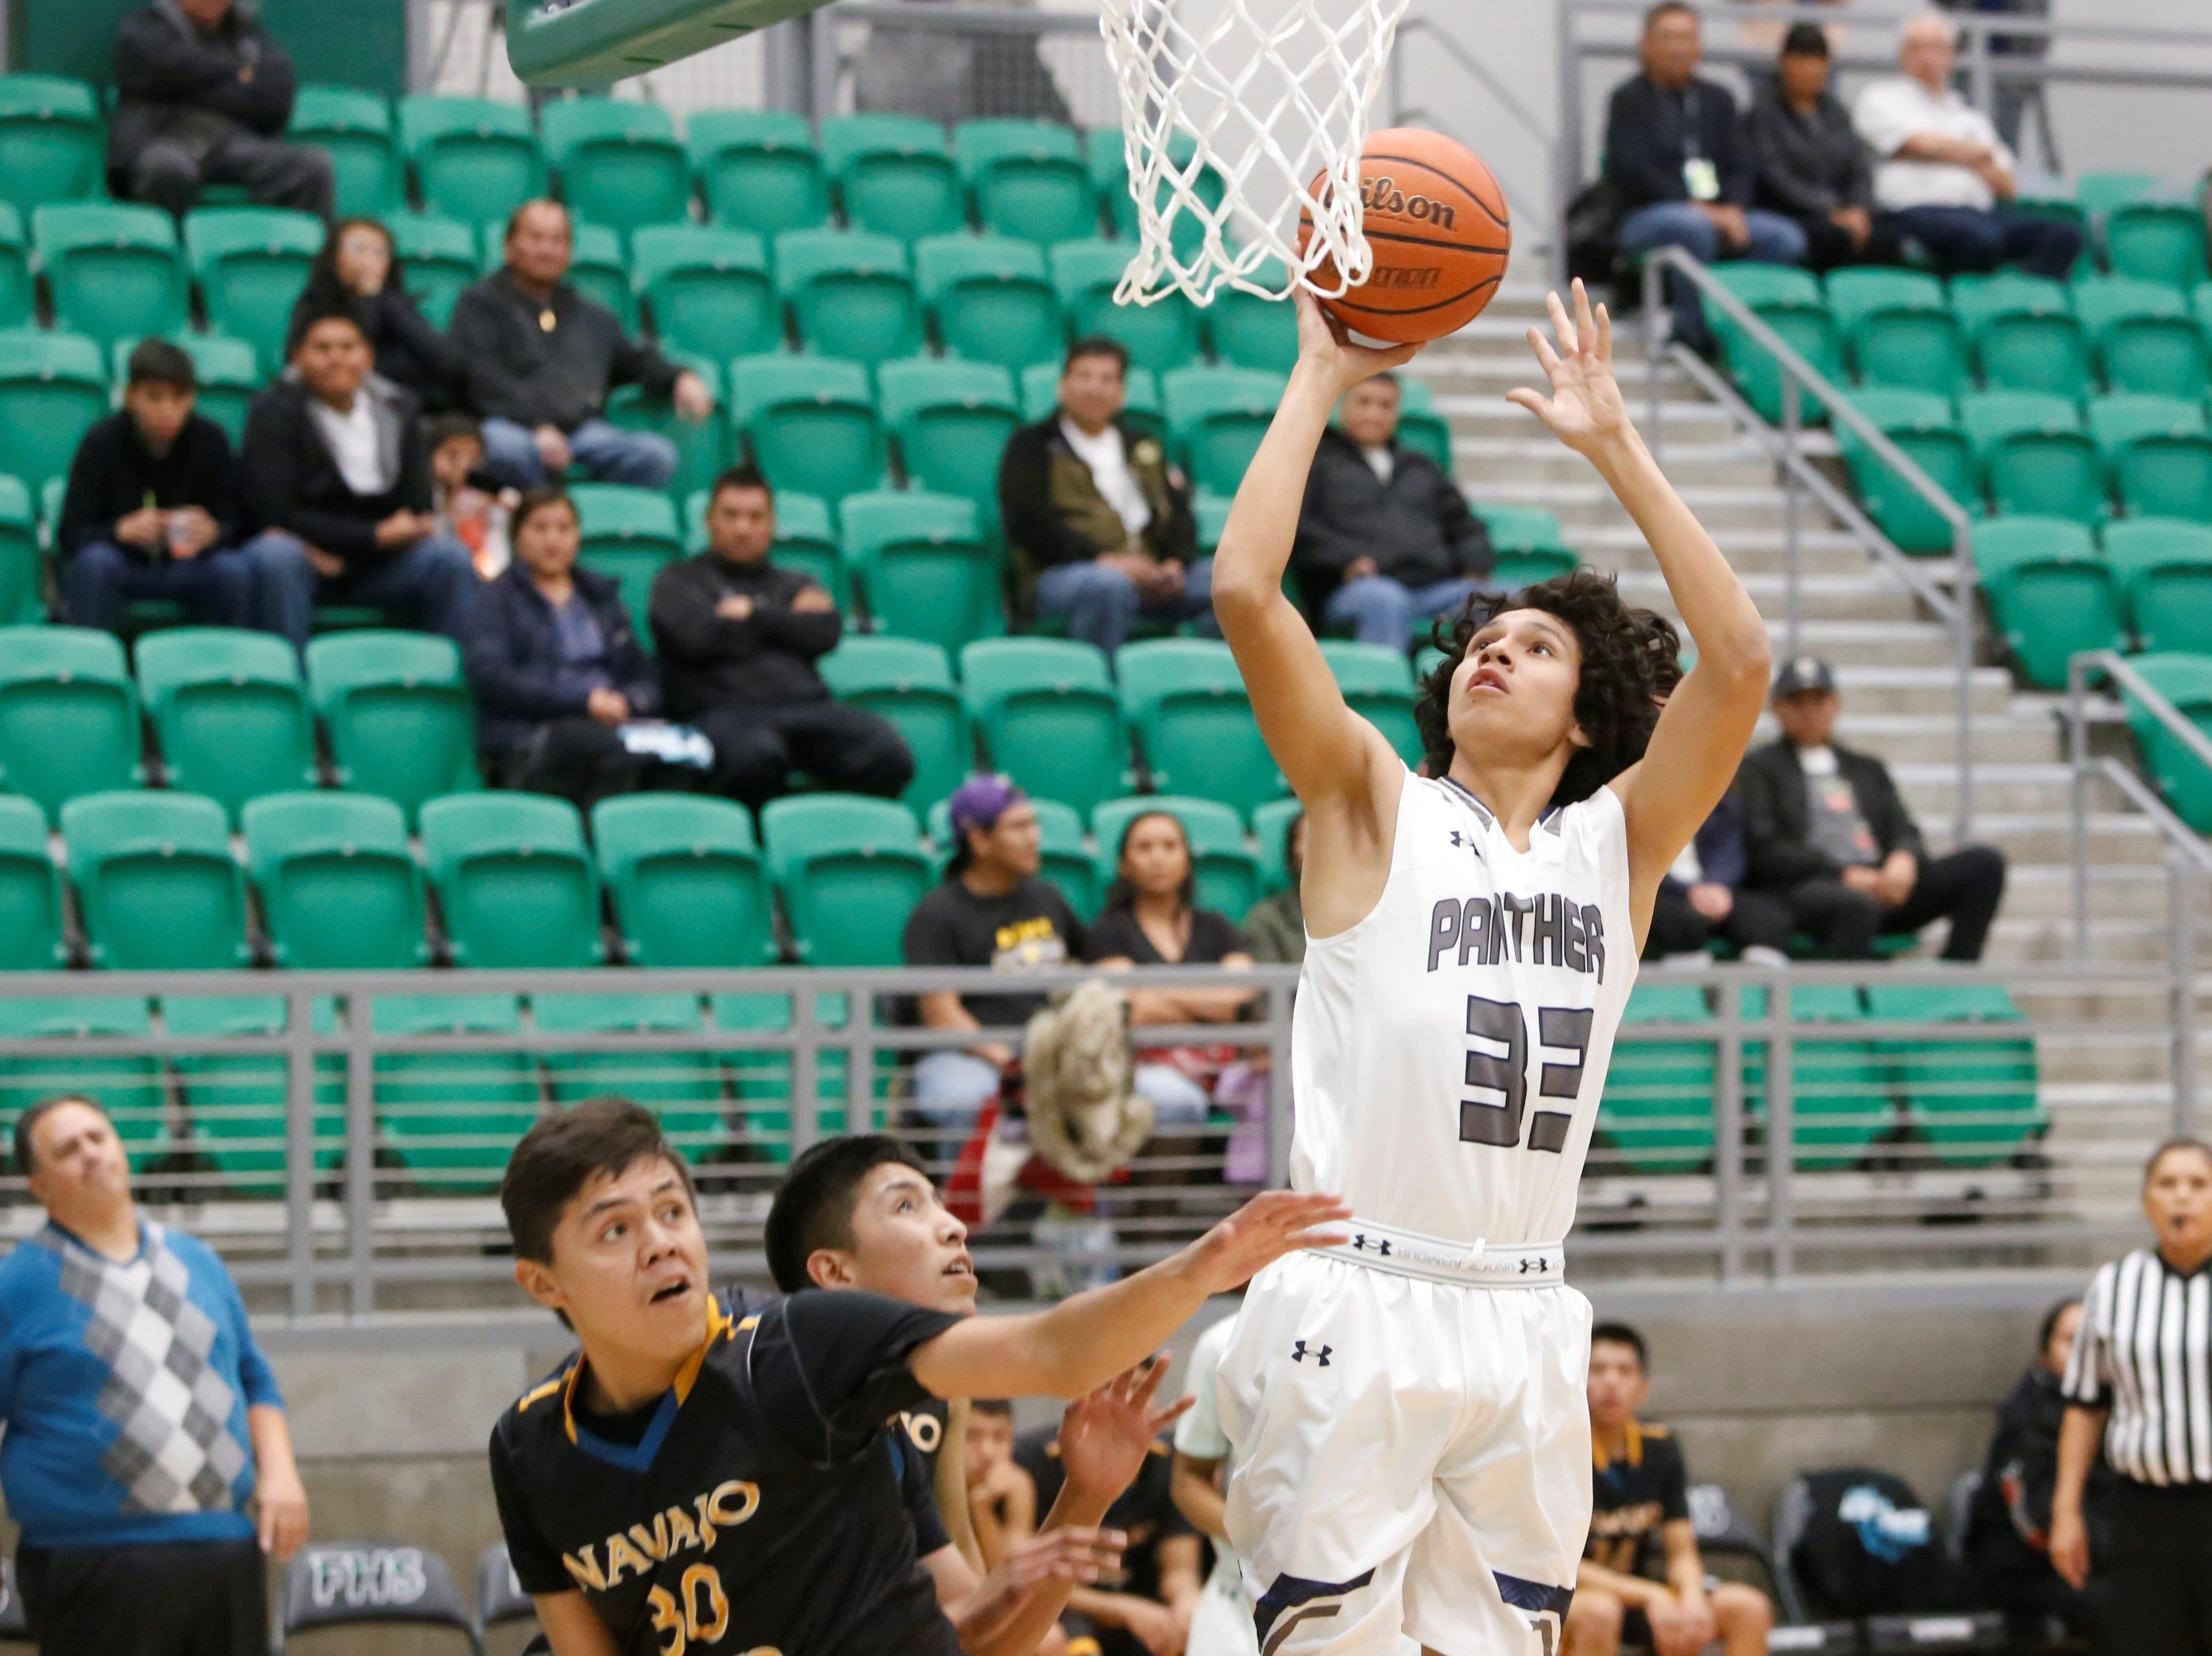 Piedra Vista's Adam Johnson jumps up and makes a basket against Navajo Prep during the Marv Sanders Invitational quarterfinals Thursday at Scorpion Arena in Farmington.